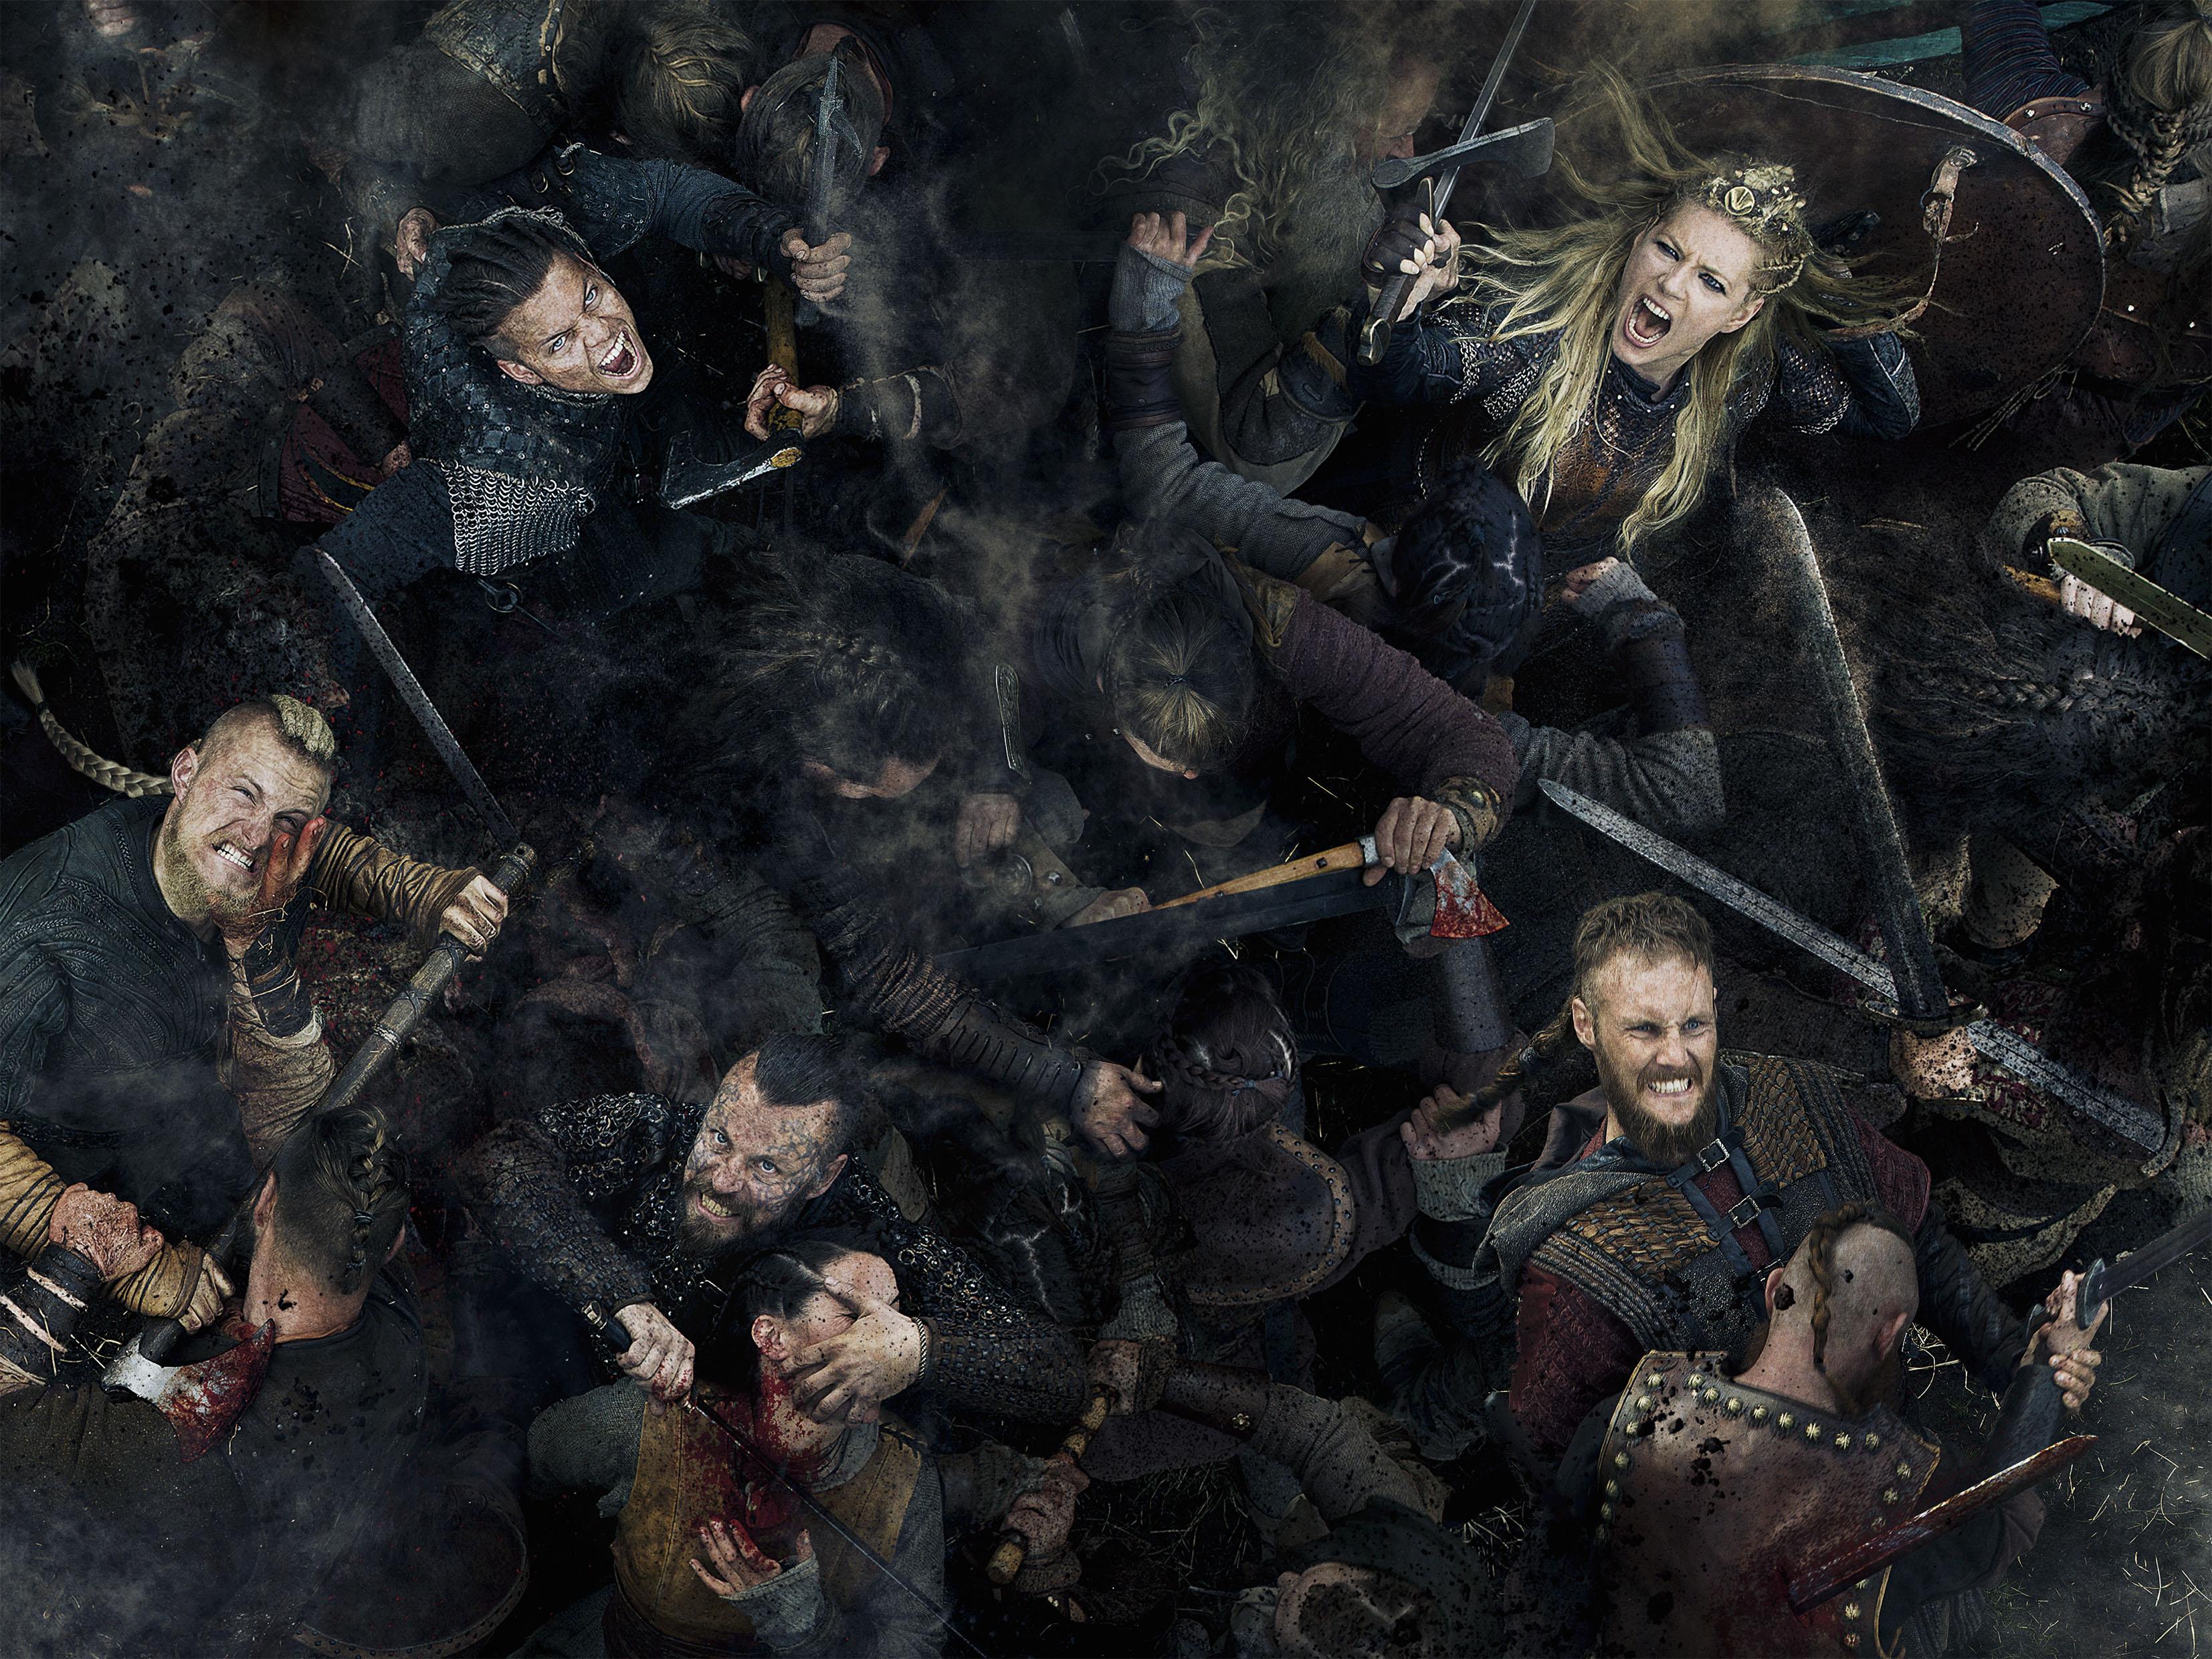 Vikings Season 5 4k Hd Tv Shows 4k Wallpapers Images Backgrounds